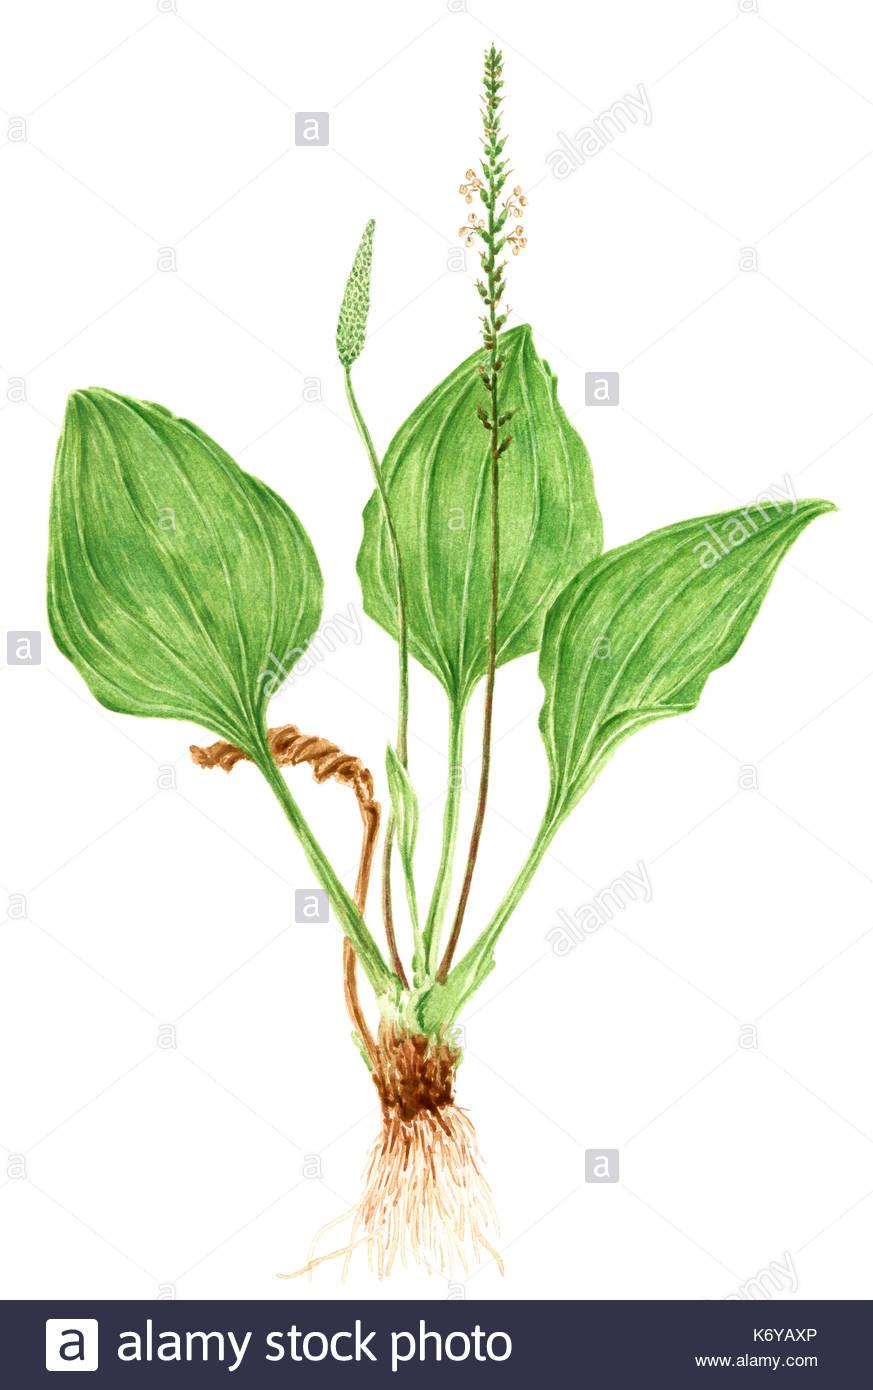 873x1390 Drawing Of A Broadleaf Plantain (Plantago Major) Plant. Watercolor